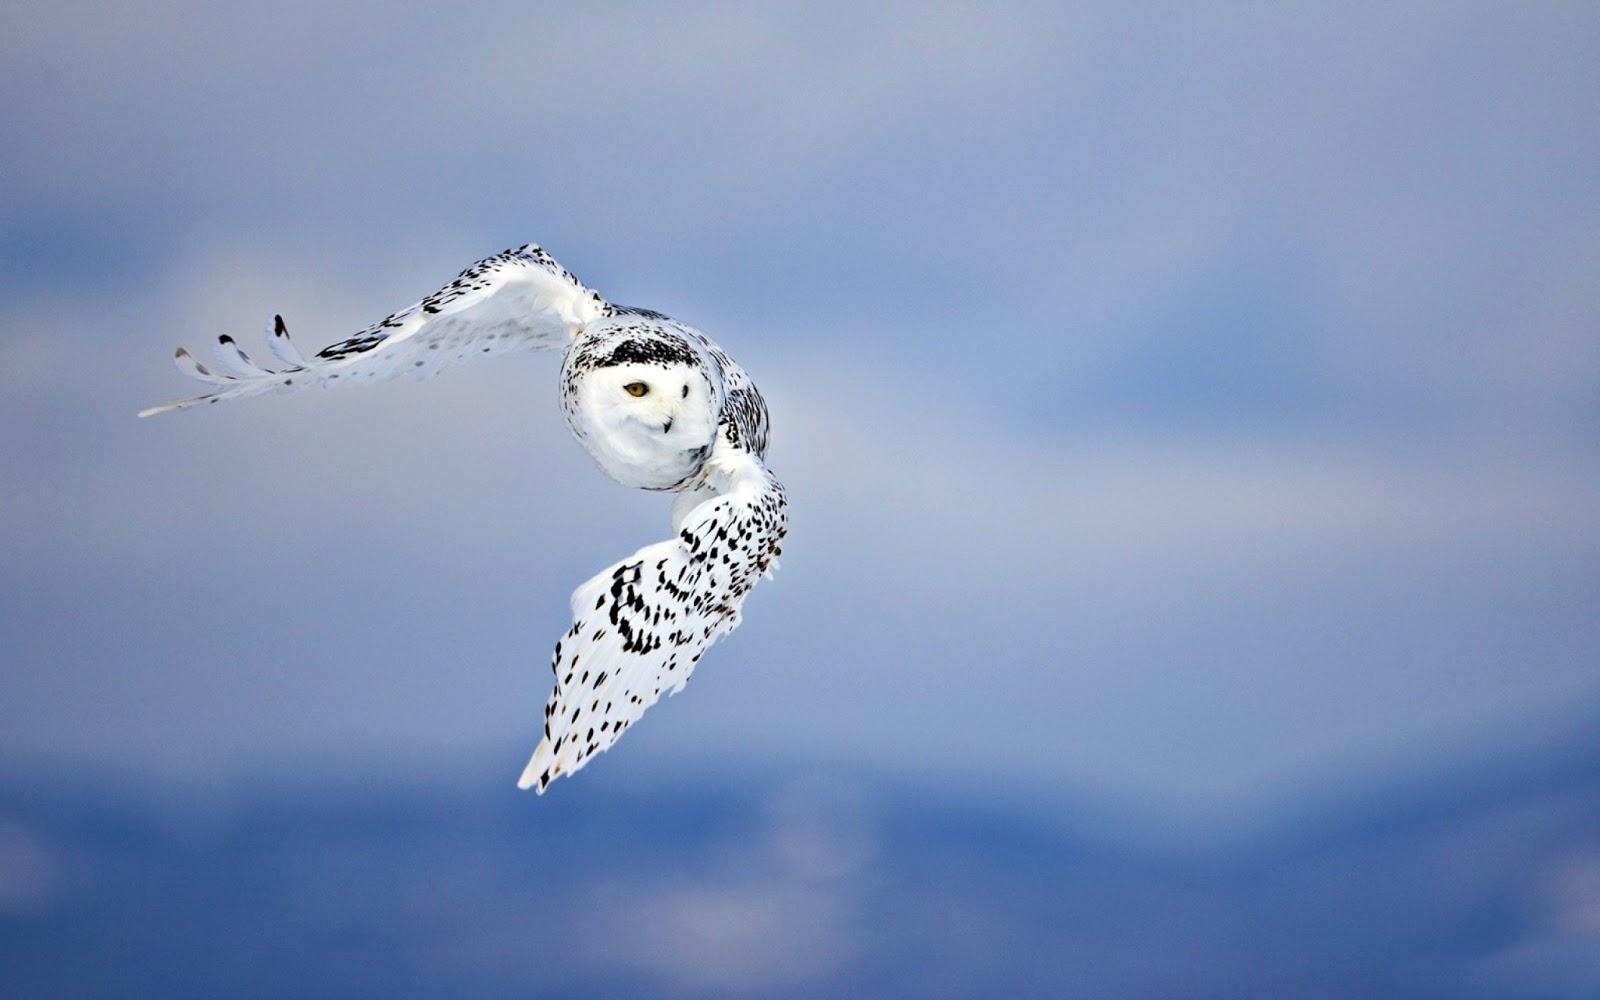 http://4.bp.blogspot.com/-M1fmapEzxO8/UPcmeWseiAI/AAAAAAAAzbY/KL_SxLIRTsM/s1600/Buho-o-lechuza-blanco-volando_Imagenes-de-Aves-Exoticas.jpg